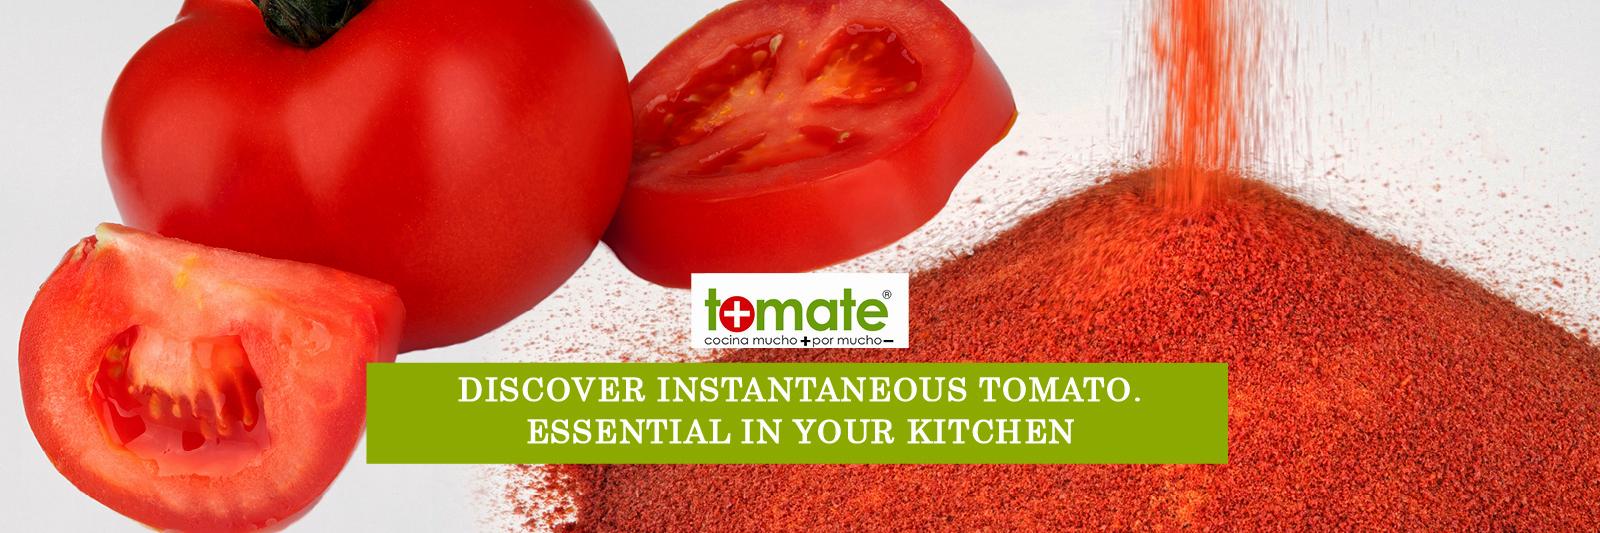 Essential in your kitchen